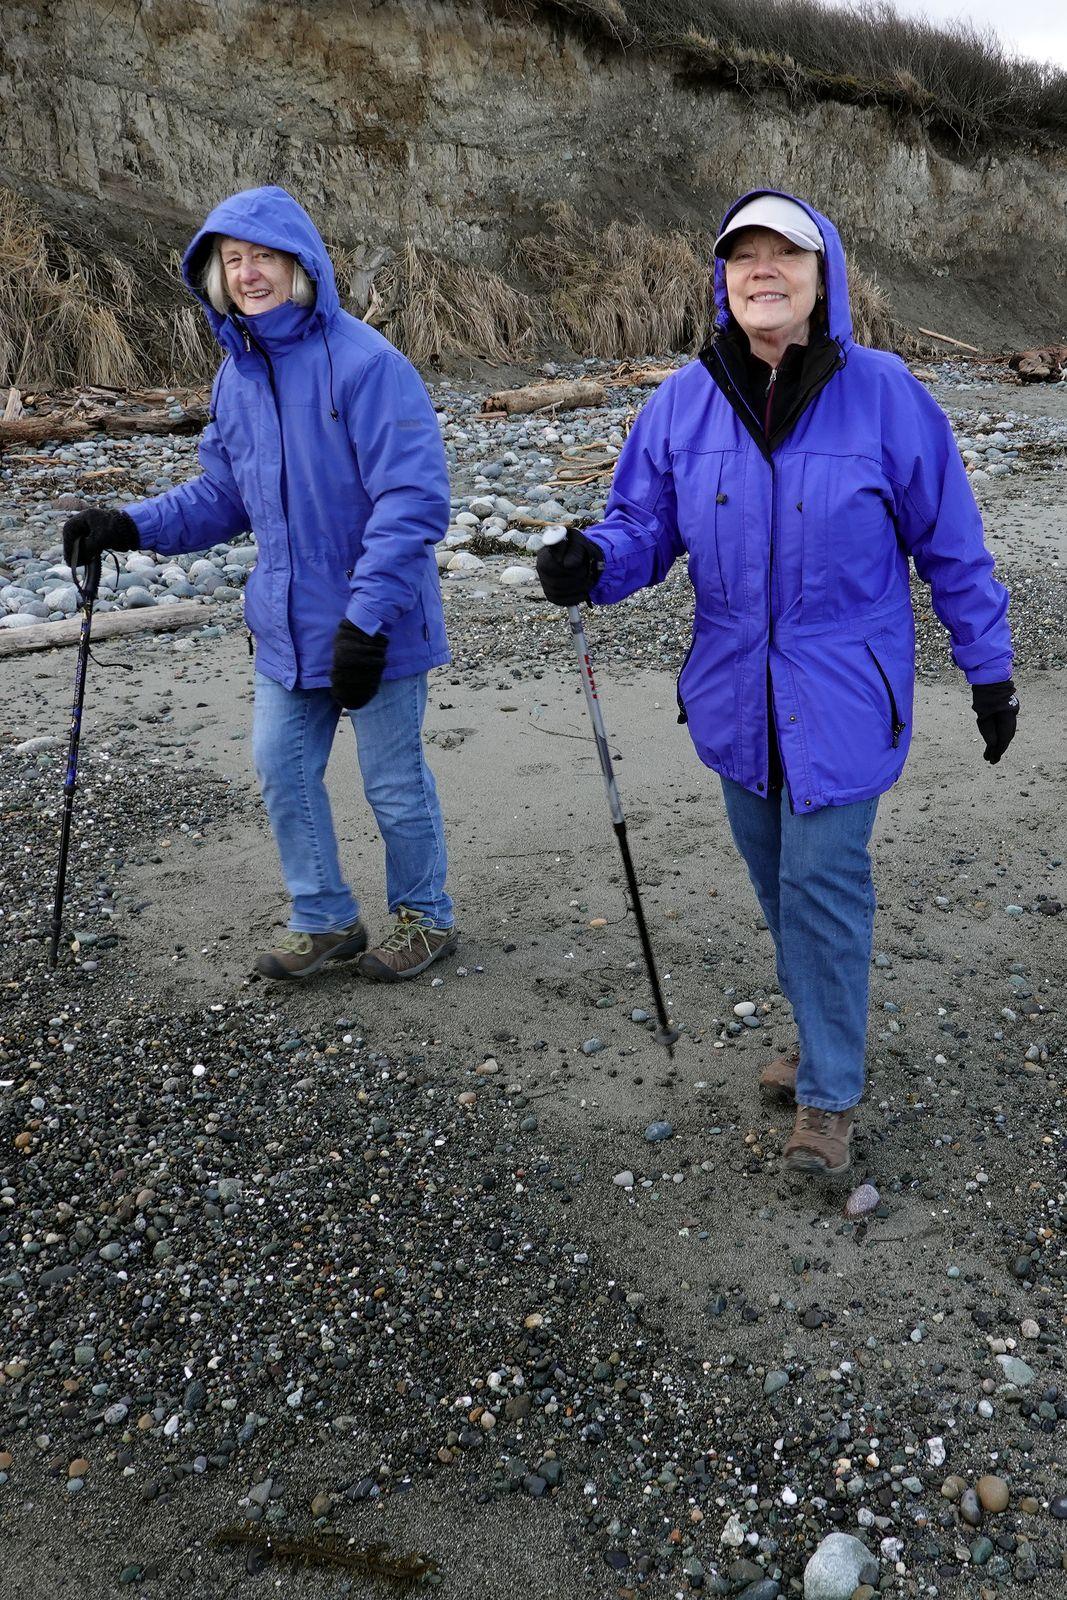 Doreen and Sarah the blue girls